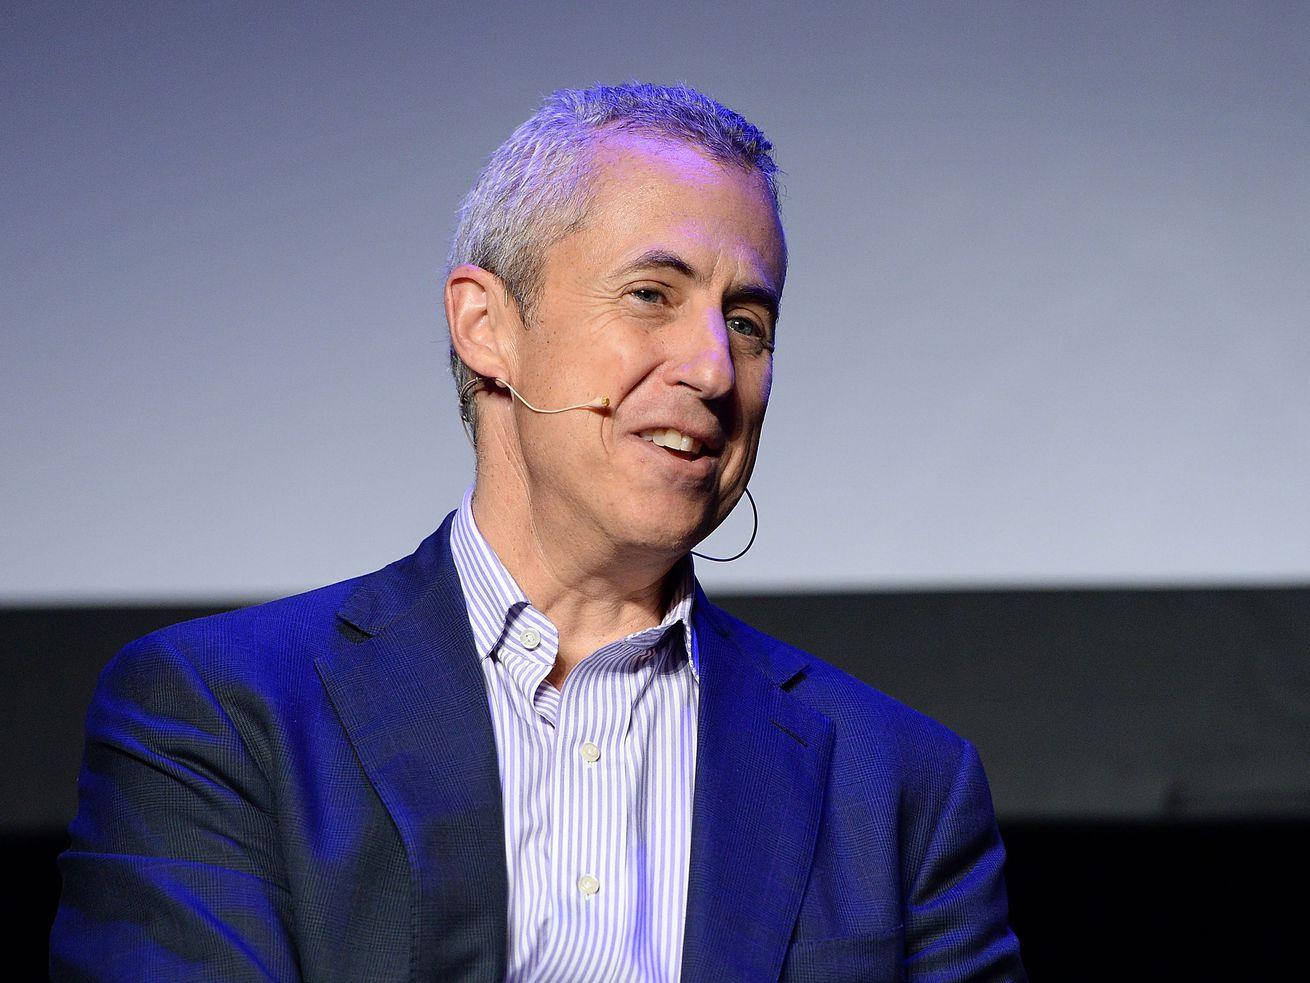 Danny Meyer Confirms Plans for a New Manhattan Restaurant